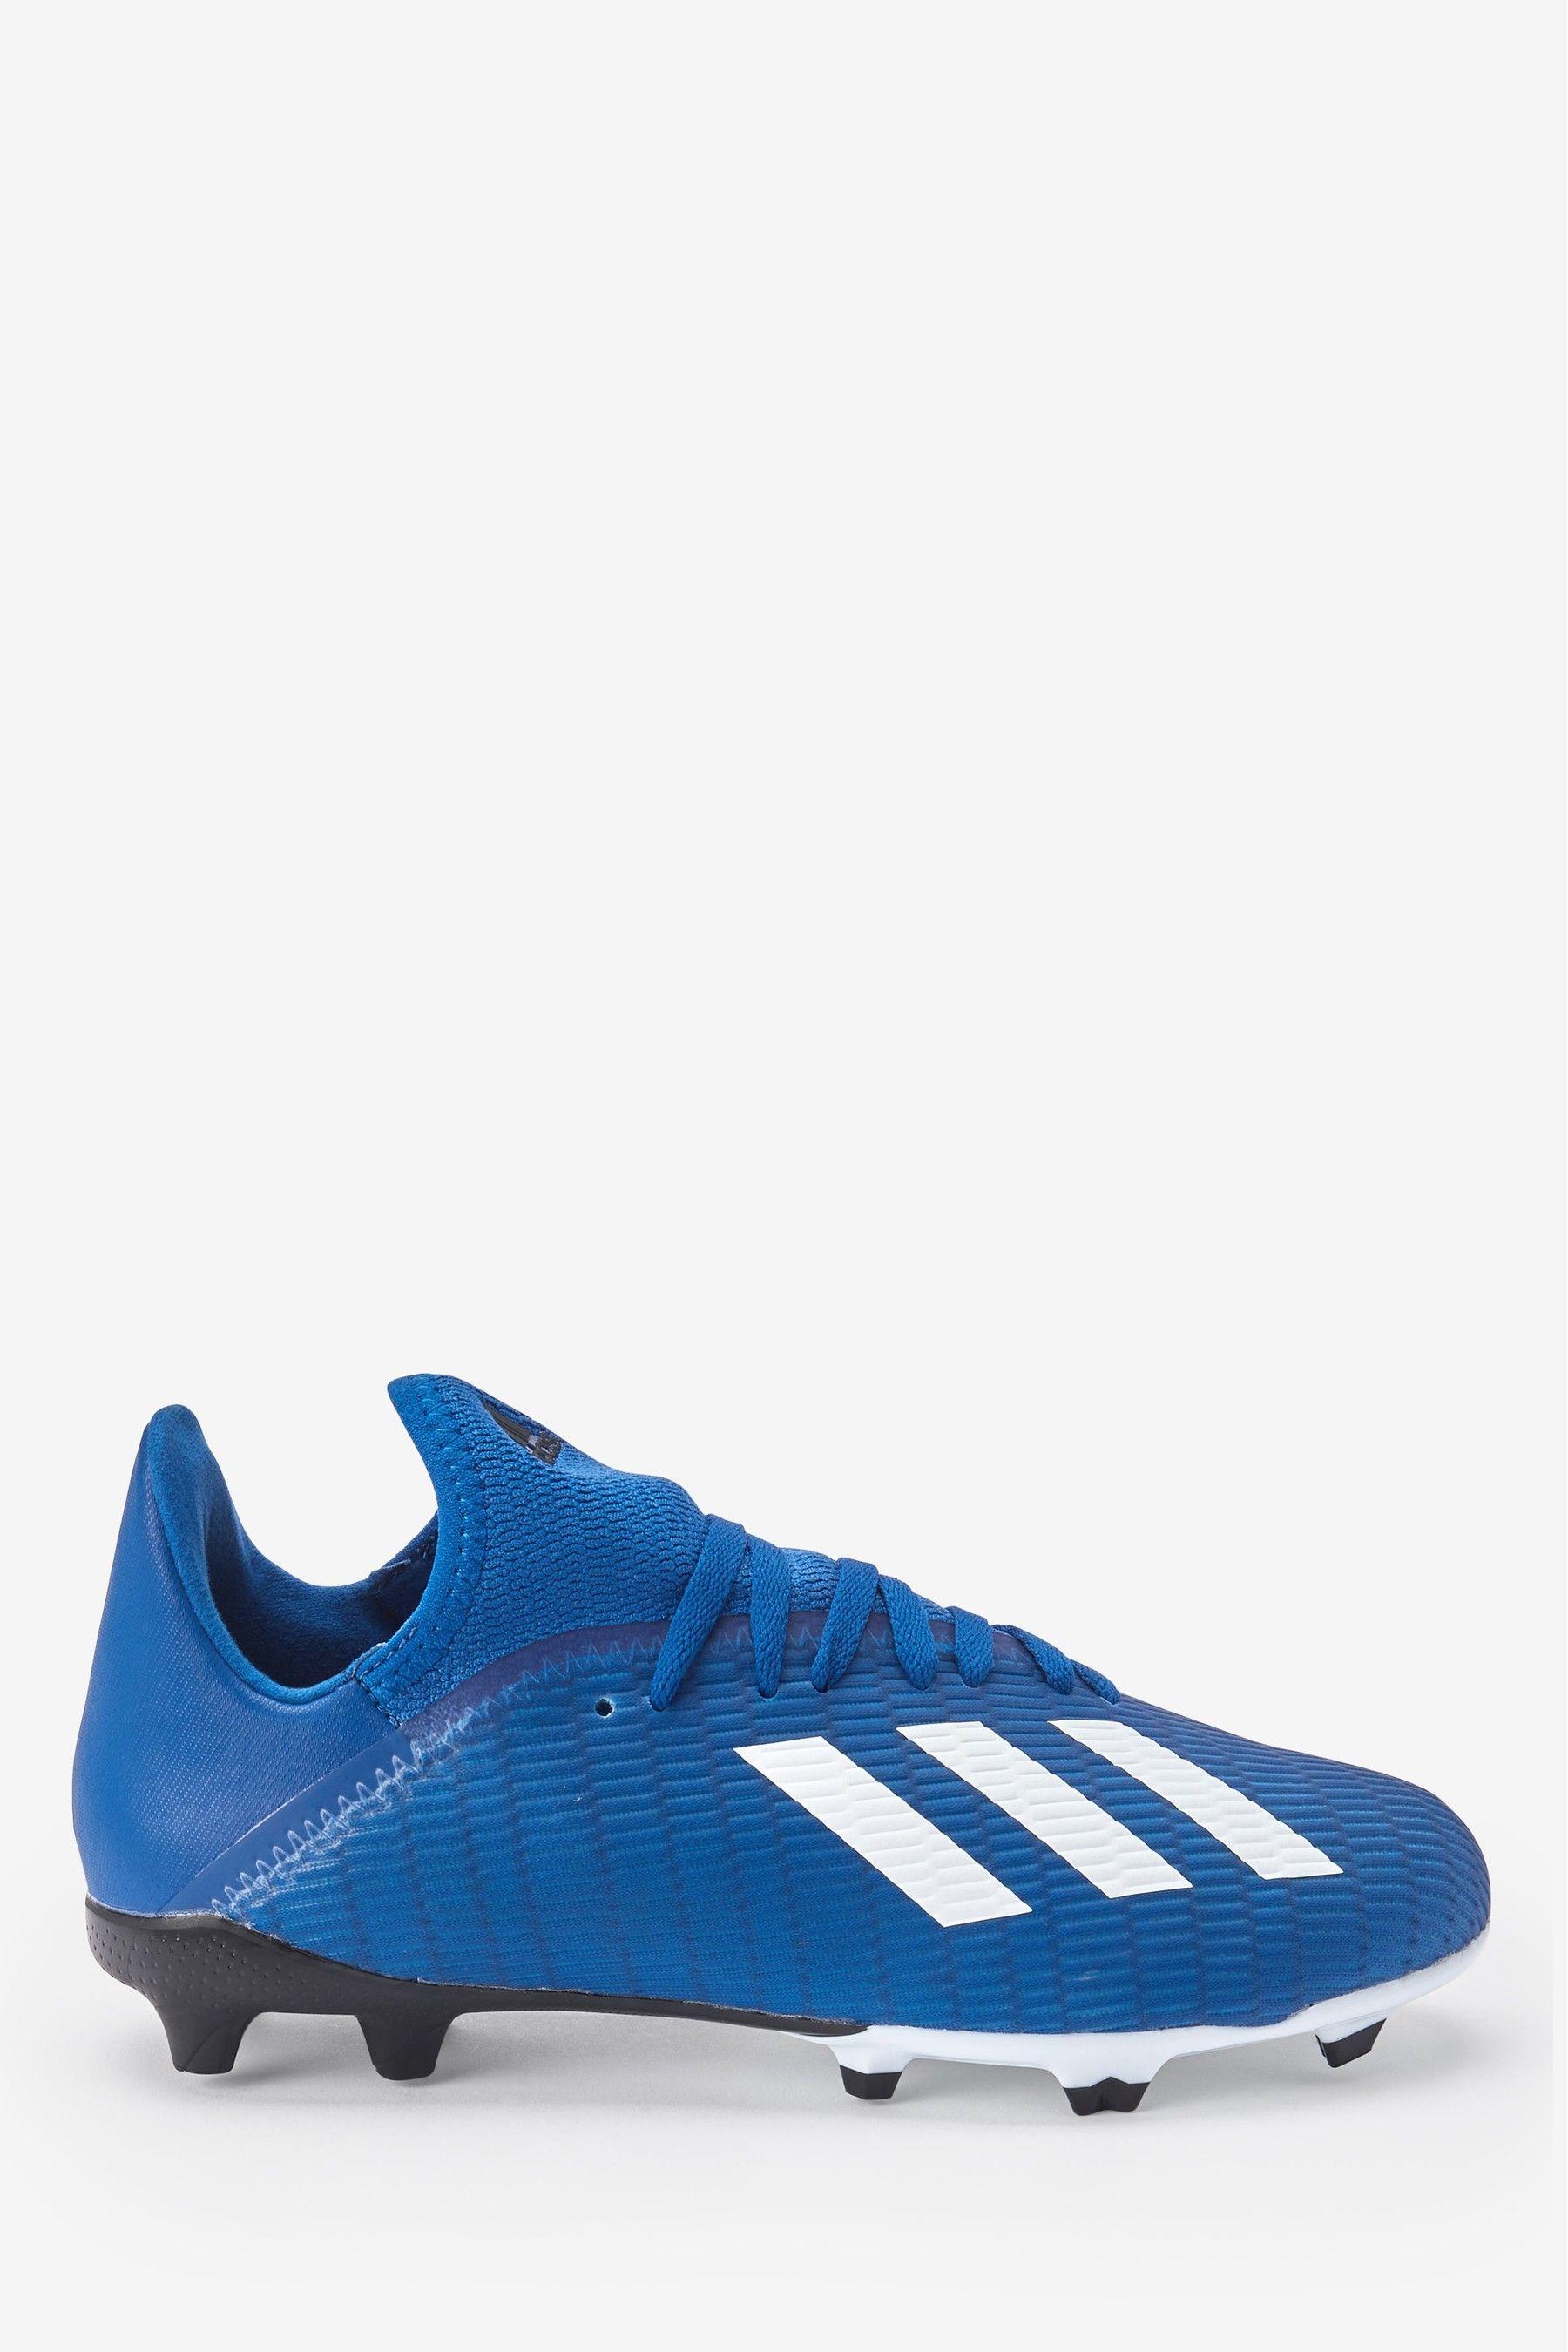 Boys adidas navy p3 x fg junior youth football boots